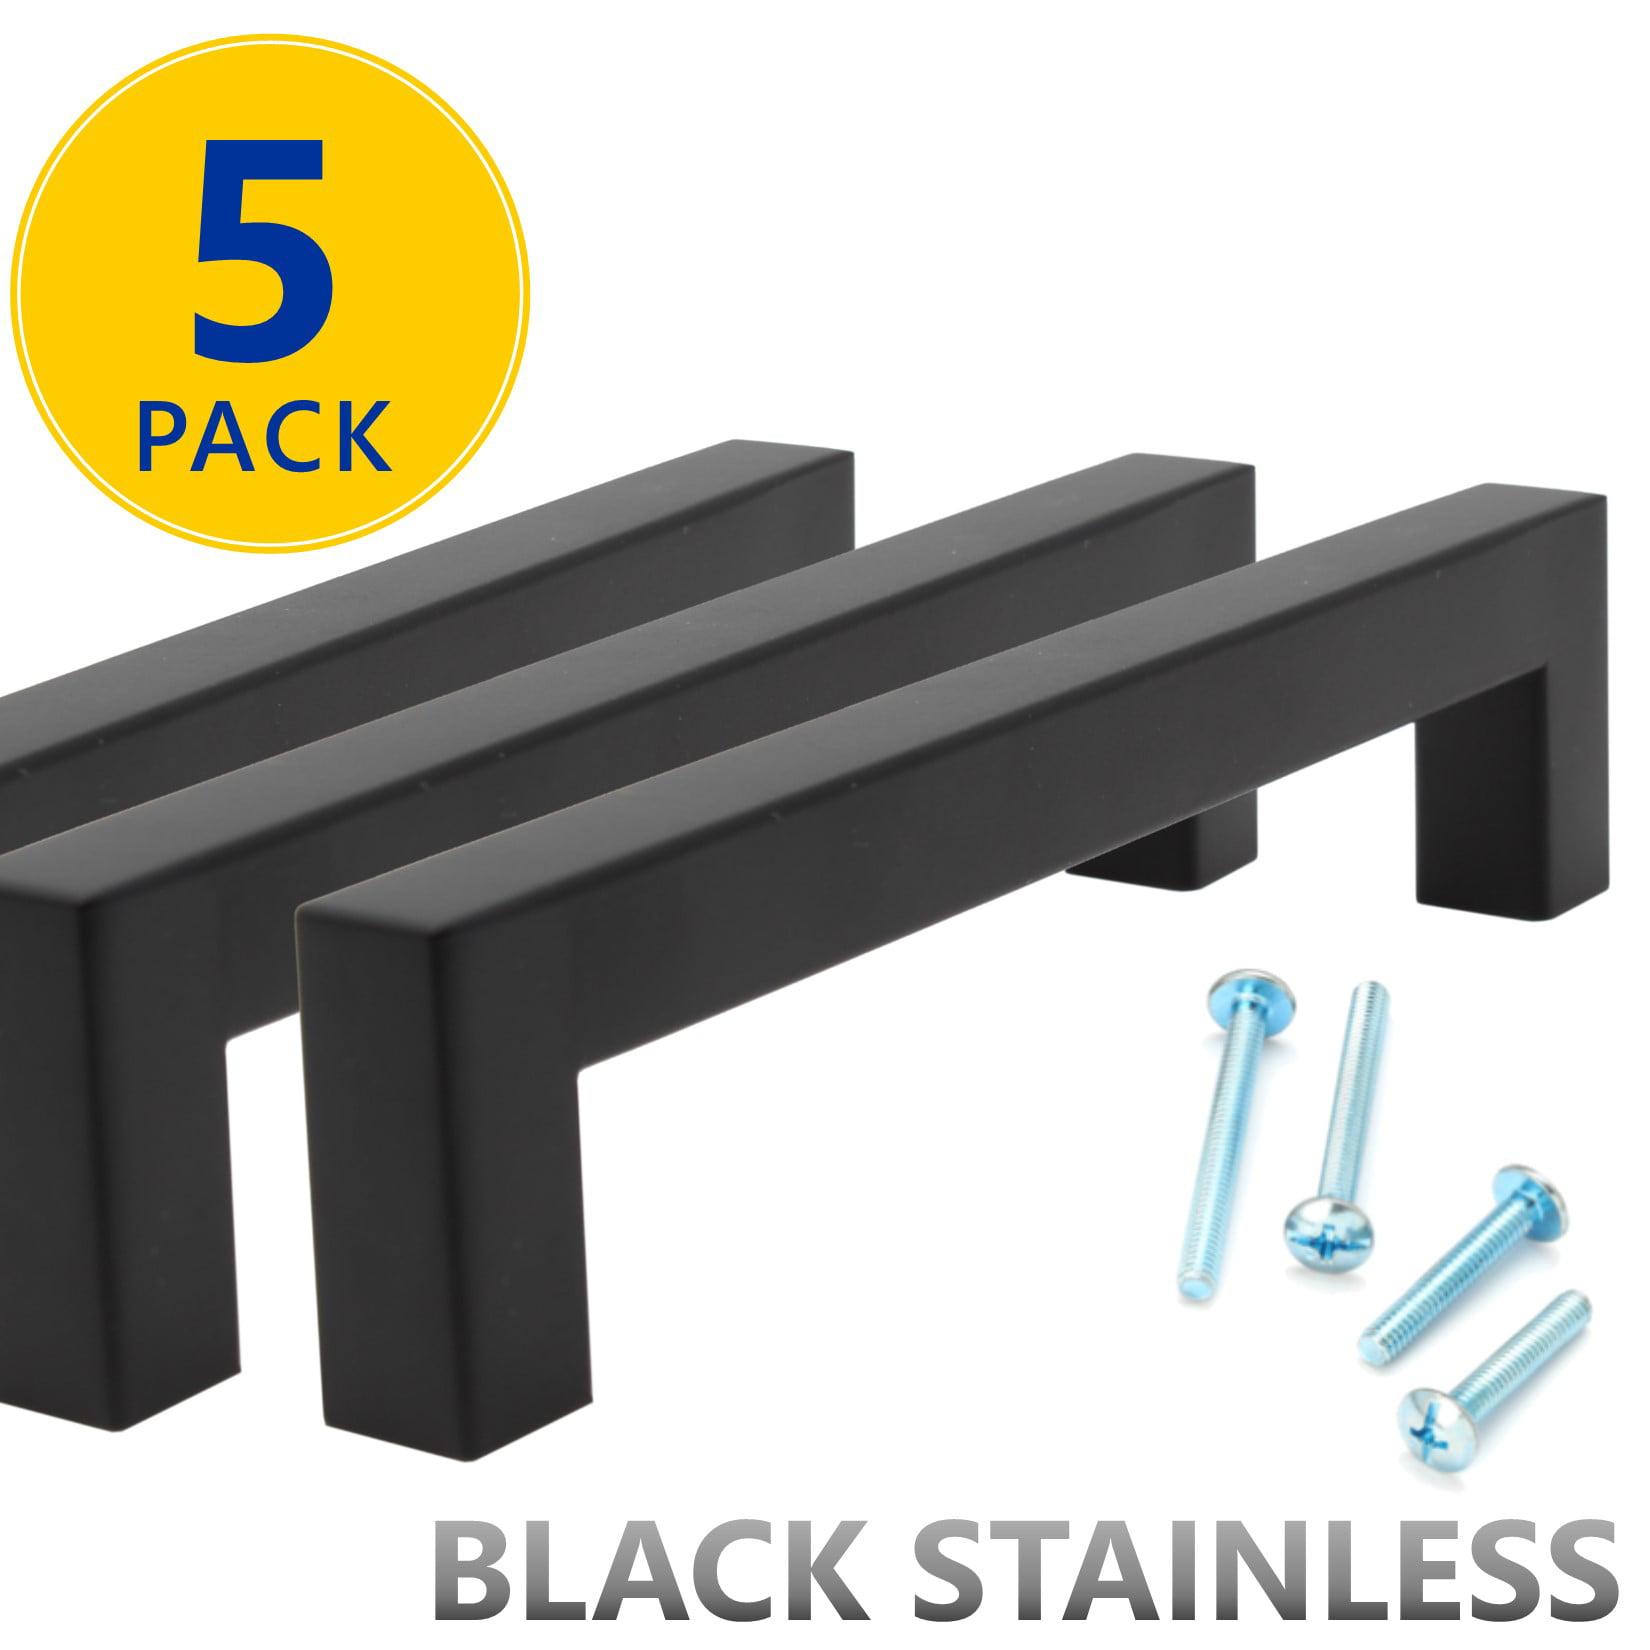 5 Pack Flat Black Square Bar Cabinet Pulls 5 Hole Center 128mm